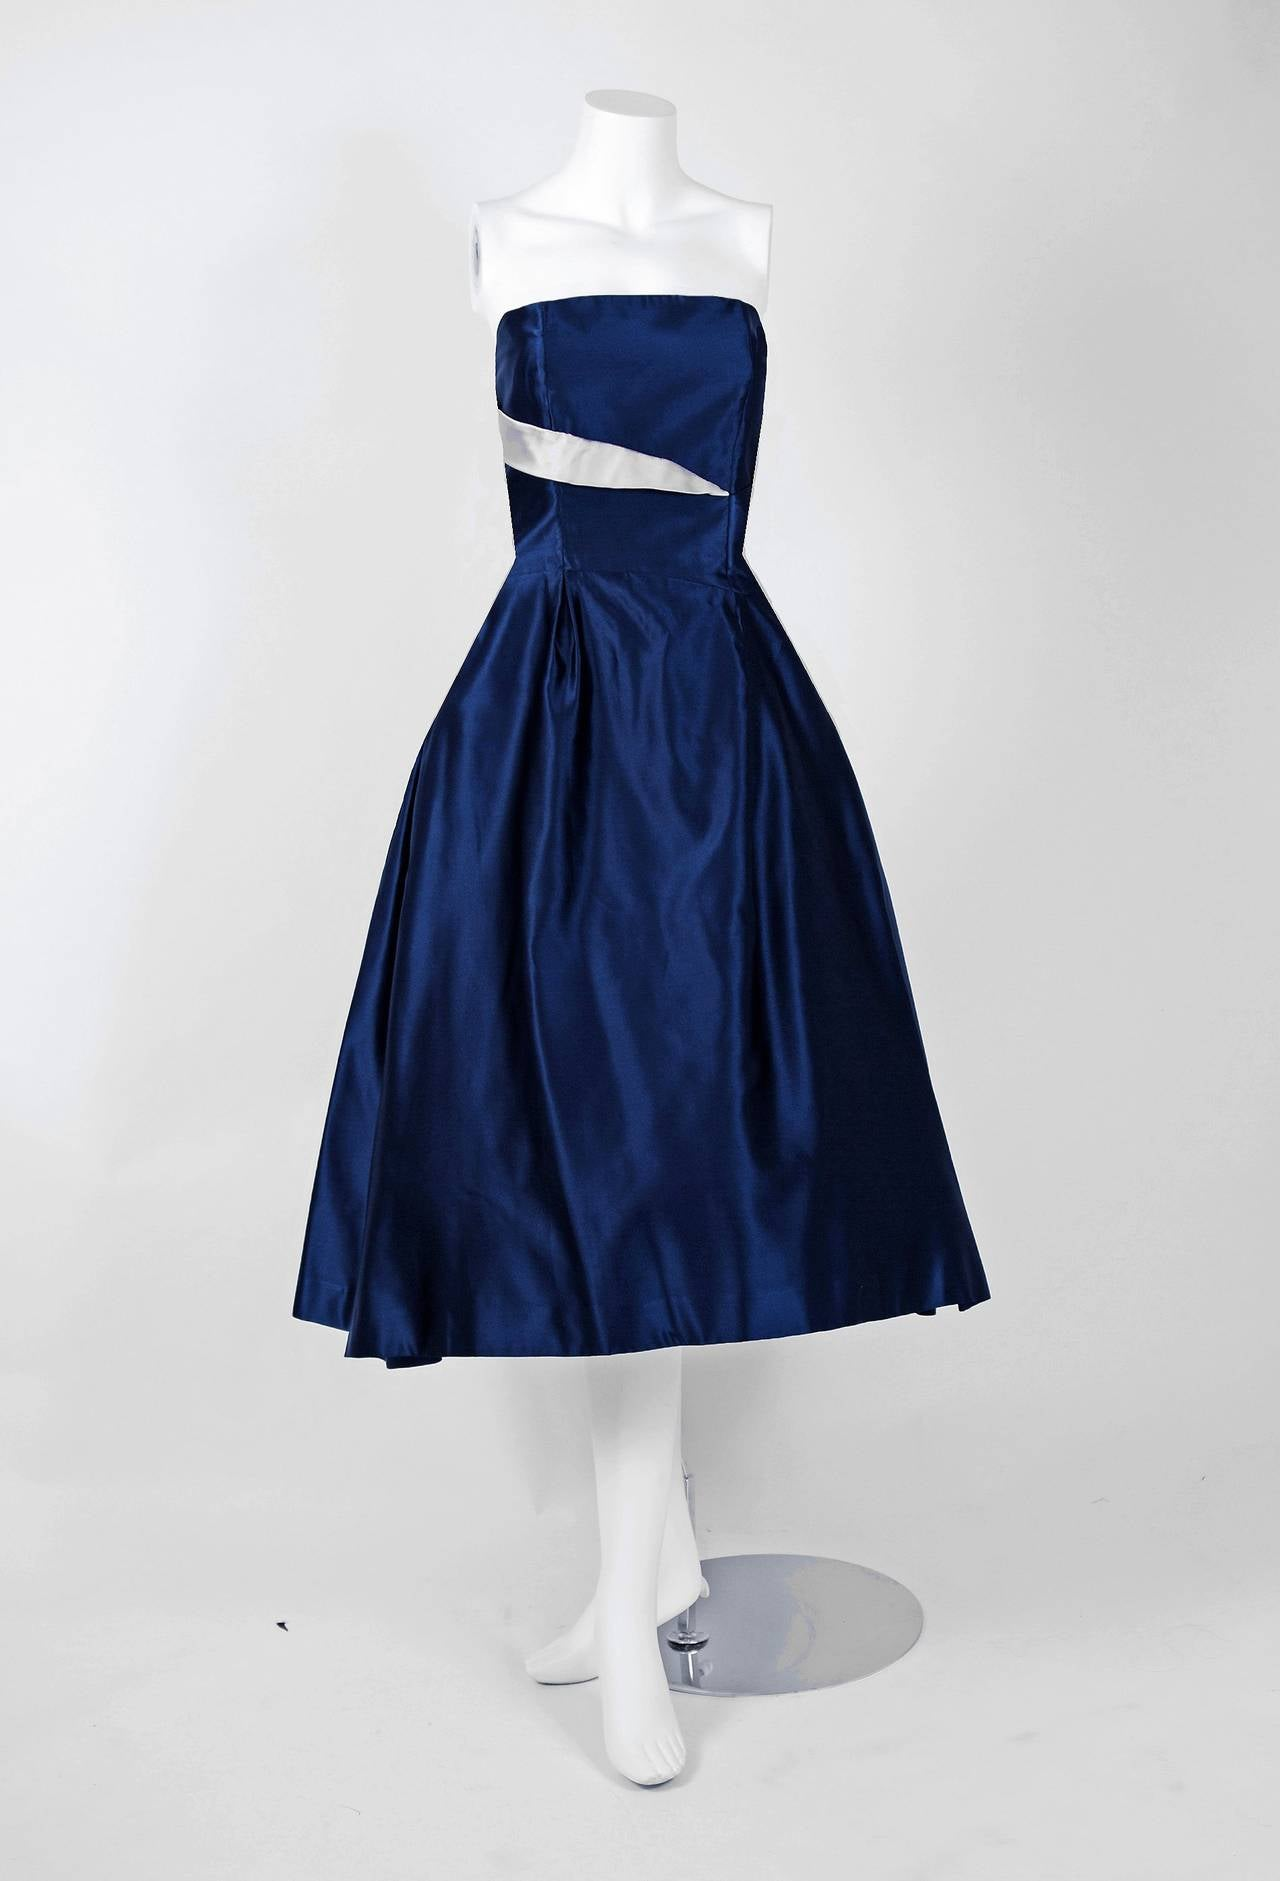 Black 1950's Lanvin Castillo Haute-Couture Navy & Ivory Satin Strapless Dress Ensemble For Sale